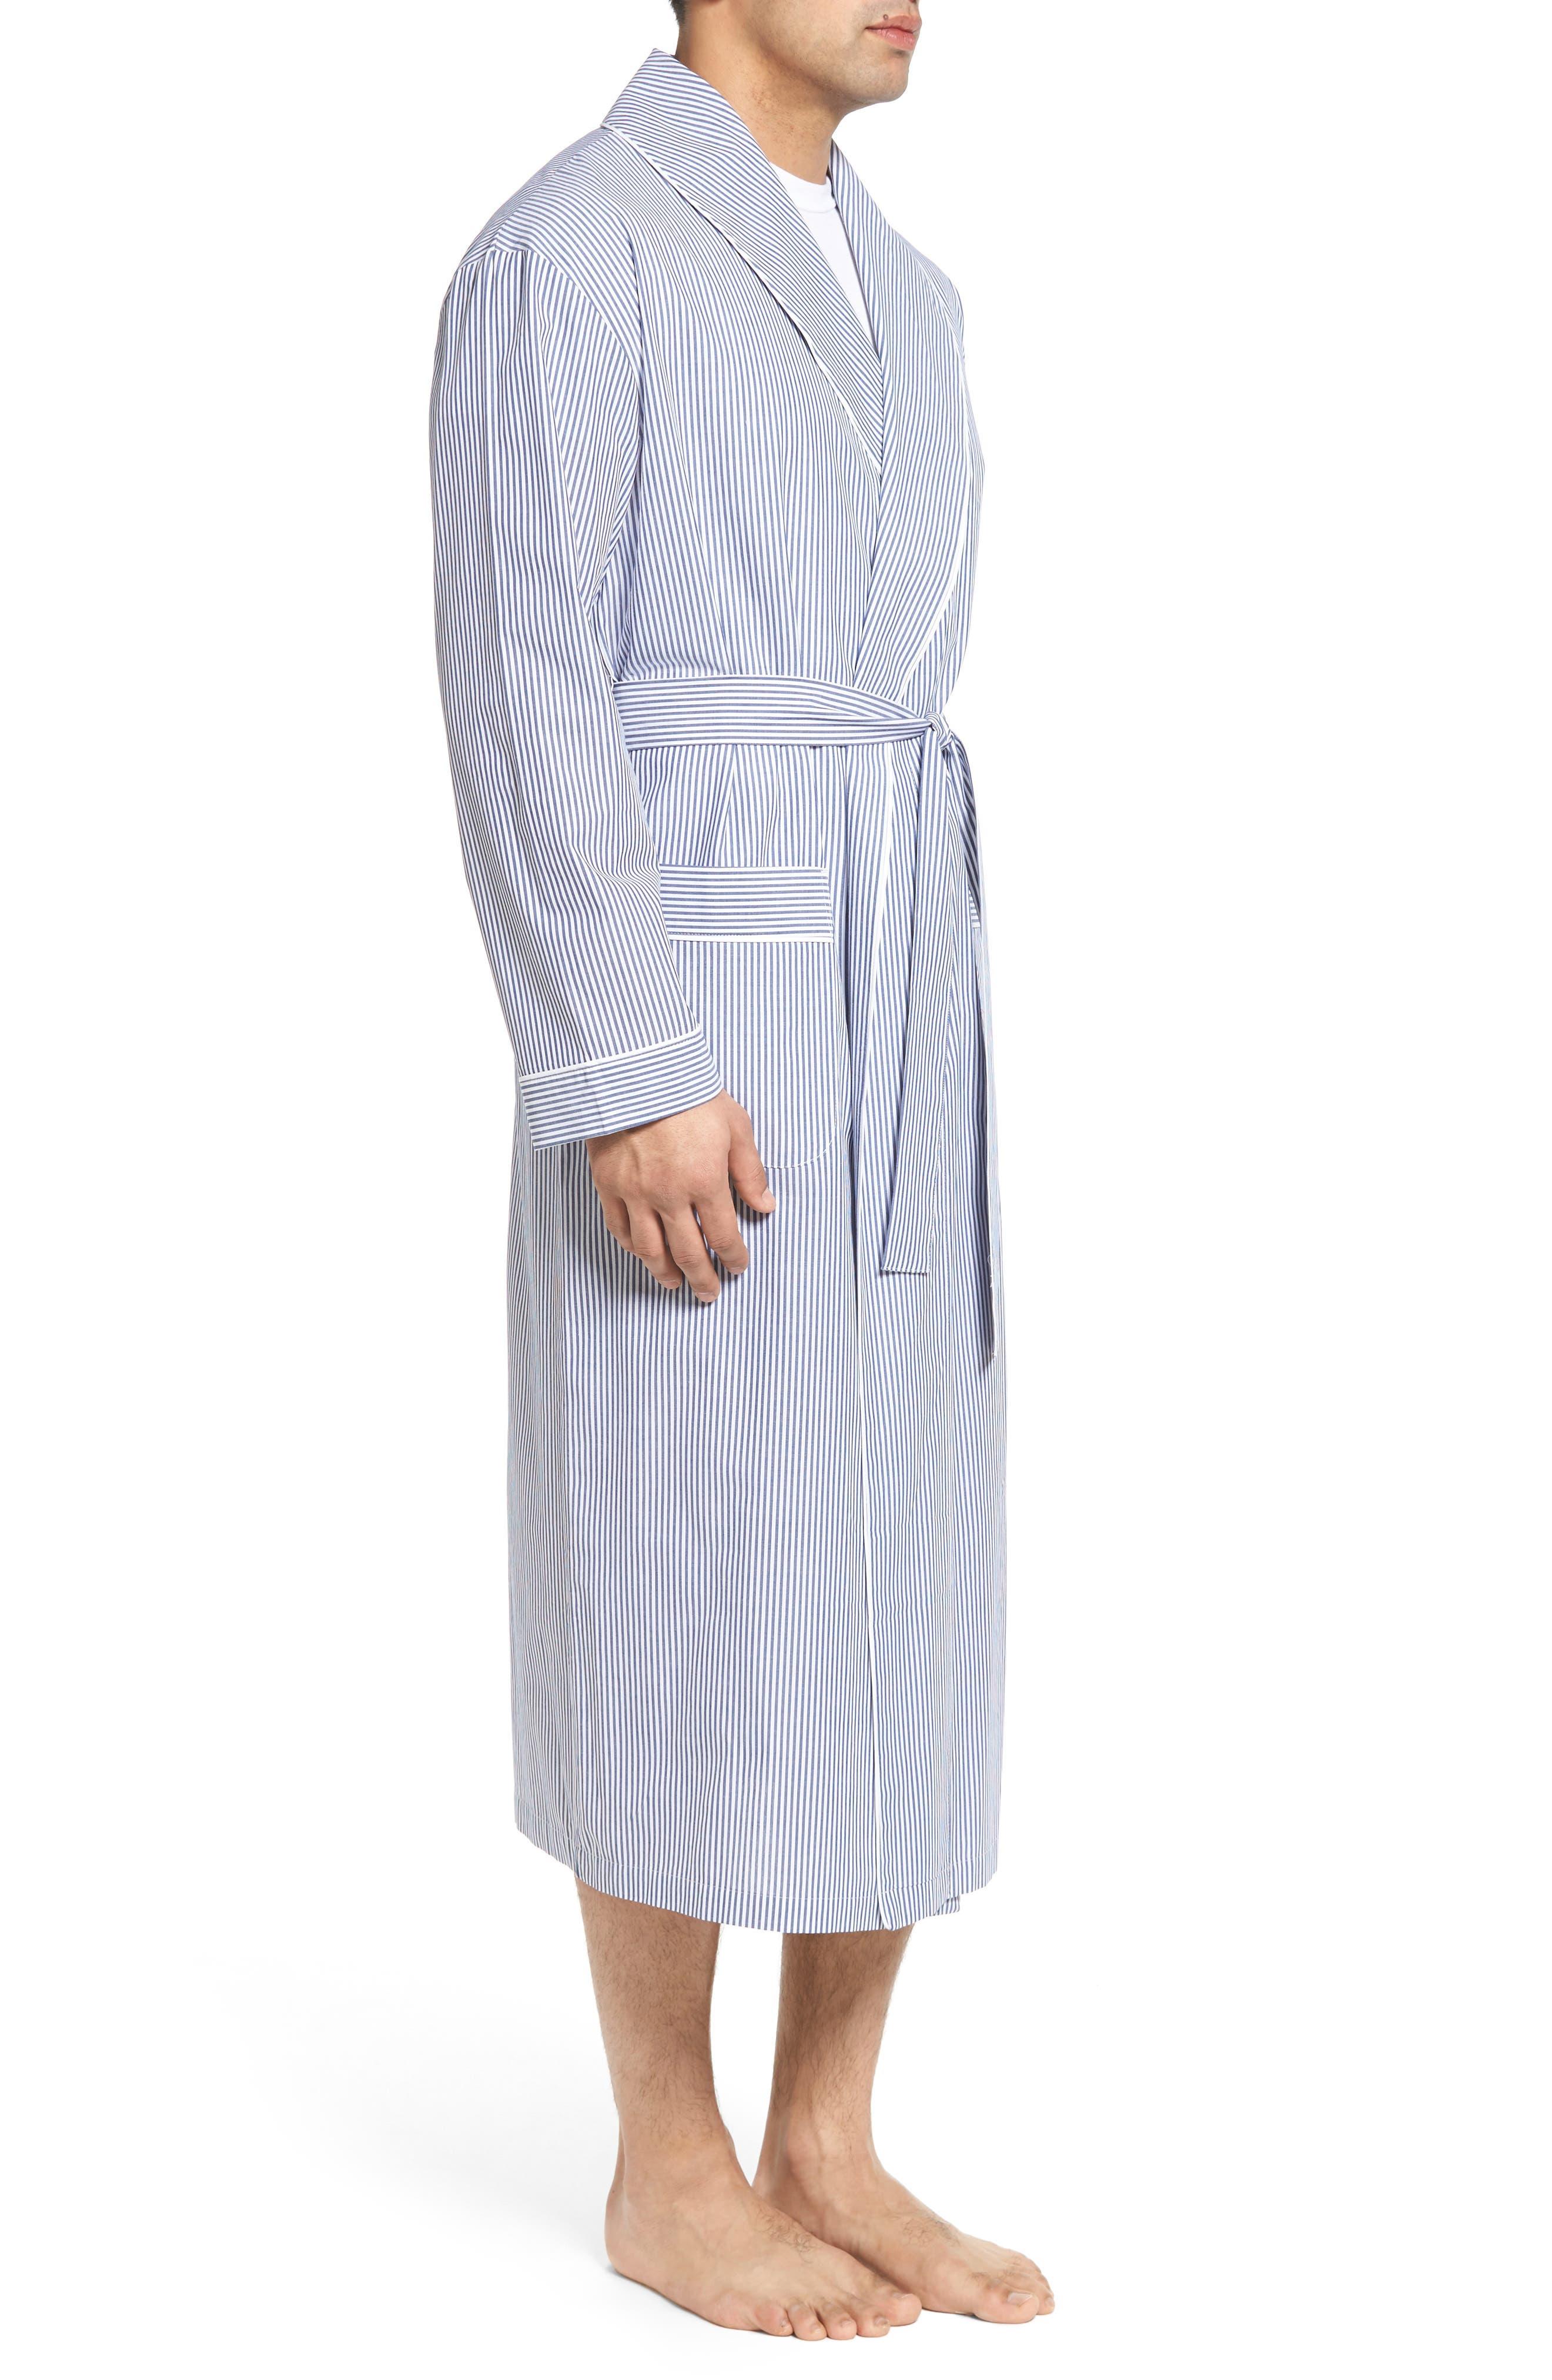 Bengal Stripe Robe,                             Alternate thumbnail 3, color,                             NAVY/ WHITE